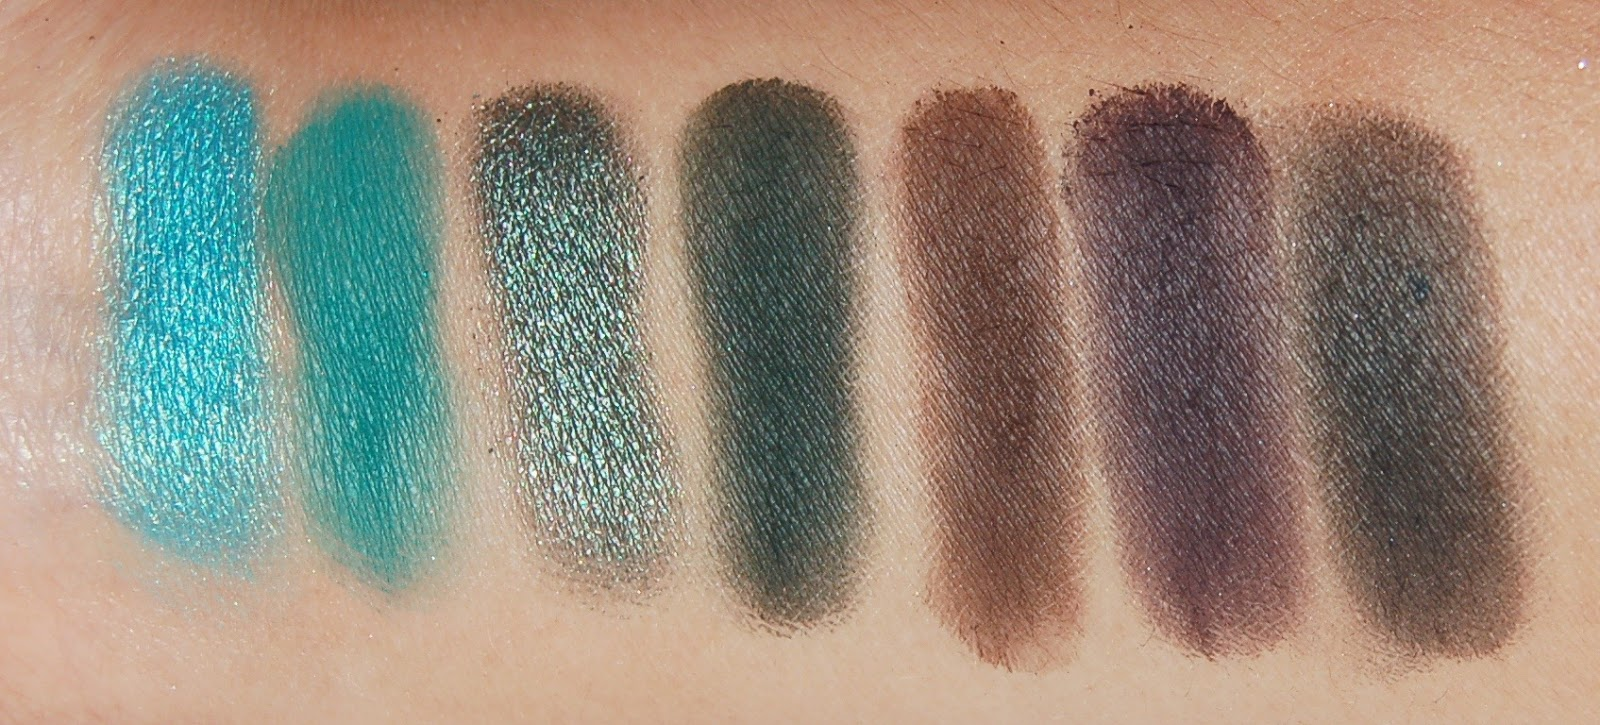 Morphe x Jaclyn Hill Eyeshadow Palette by Morphe #8